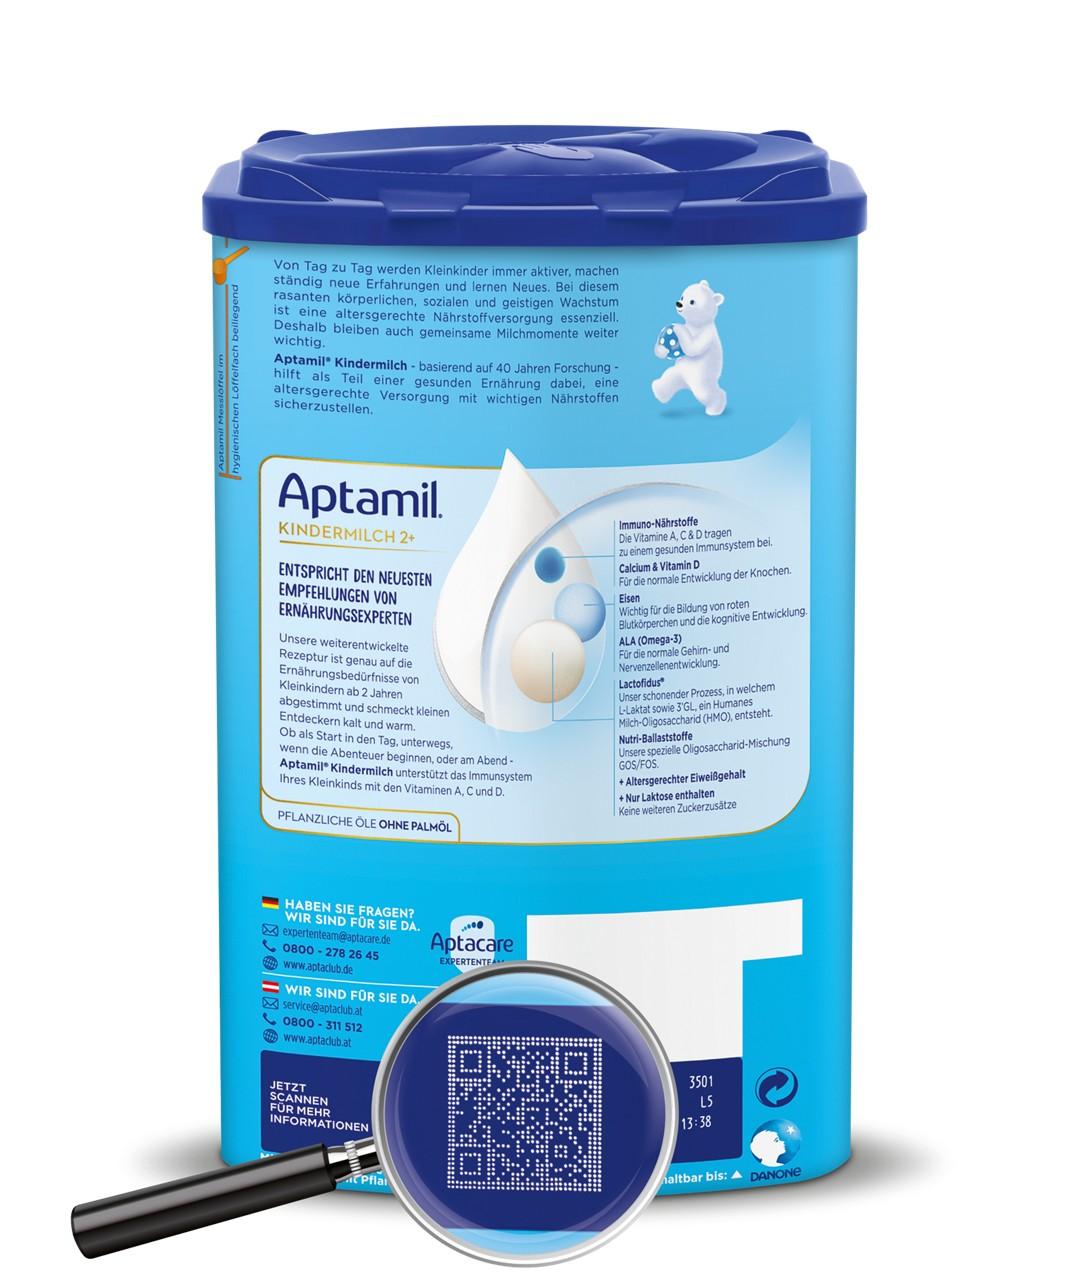 Aptamil EZP BOP ROLEX Code Lupe GUM 2